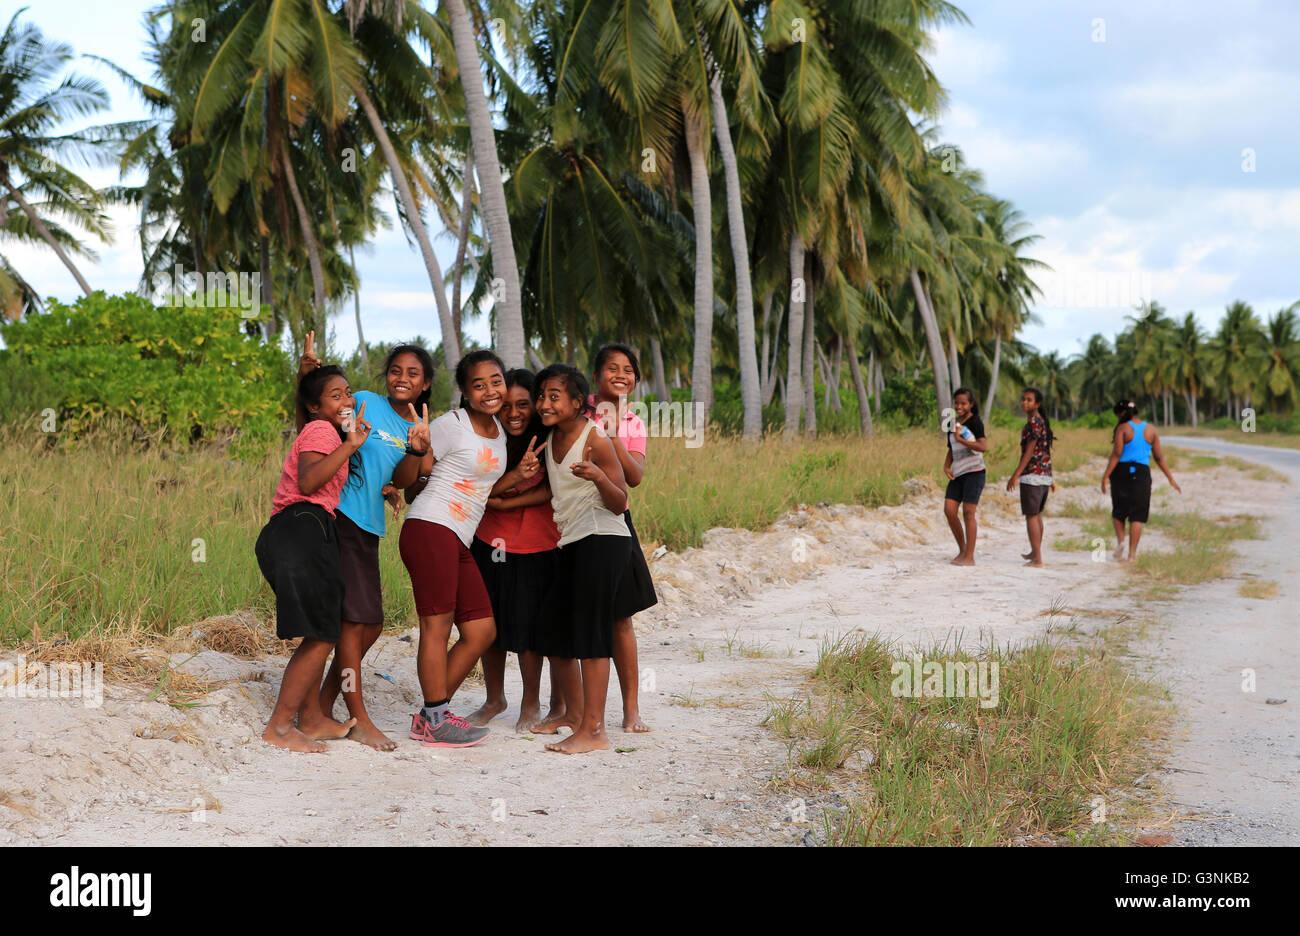 Local girls walking along the road in the evening, Christmas Island, Kiribati - Stock Image